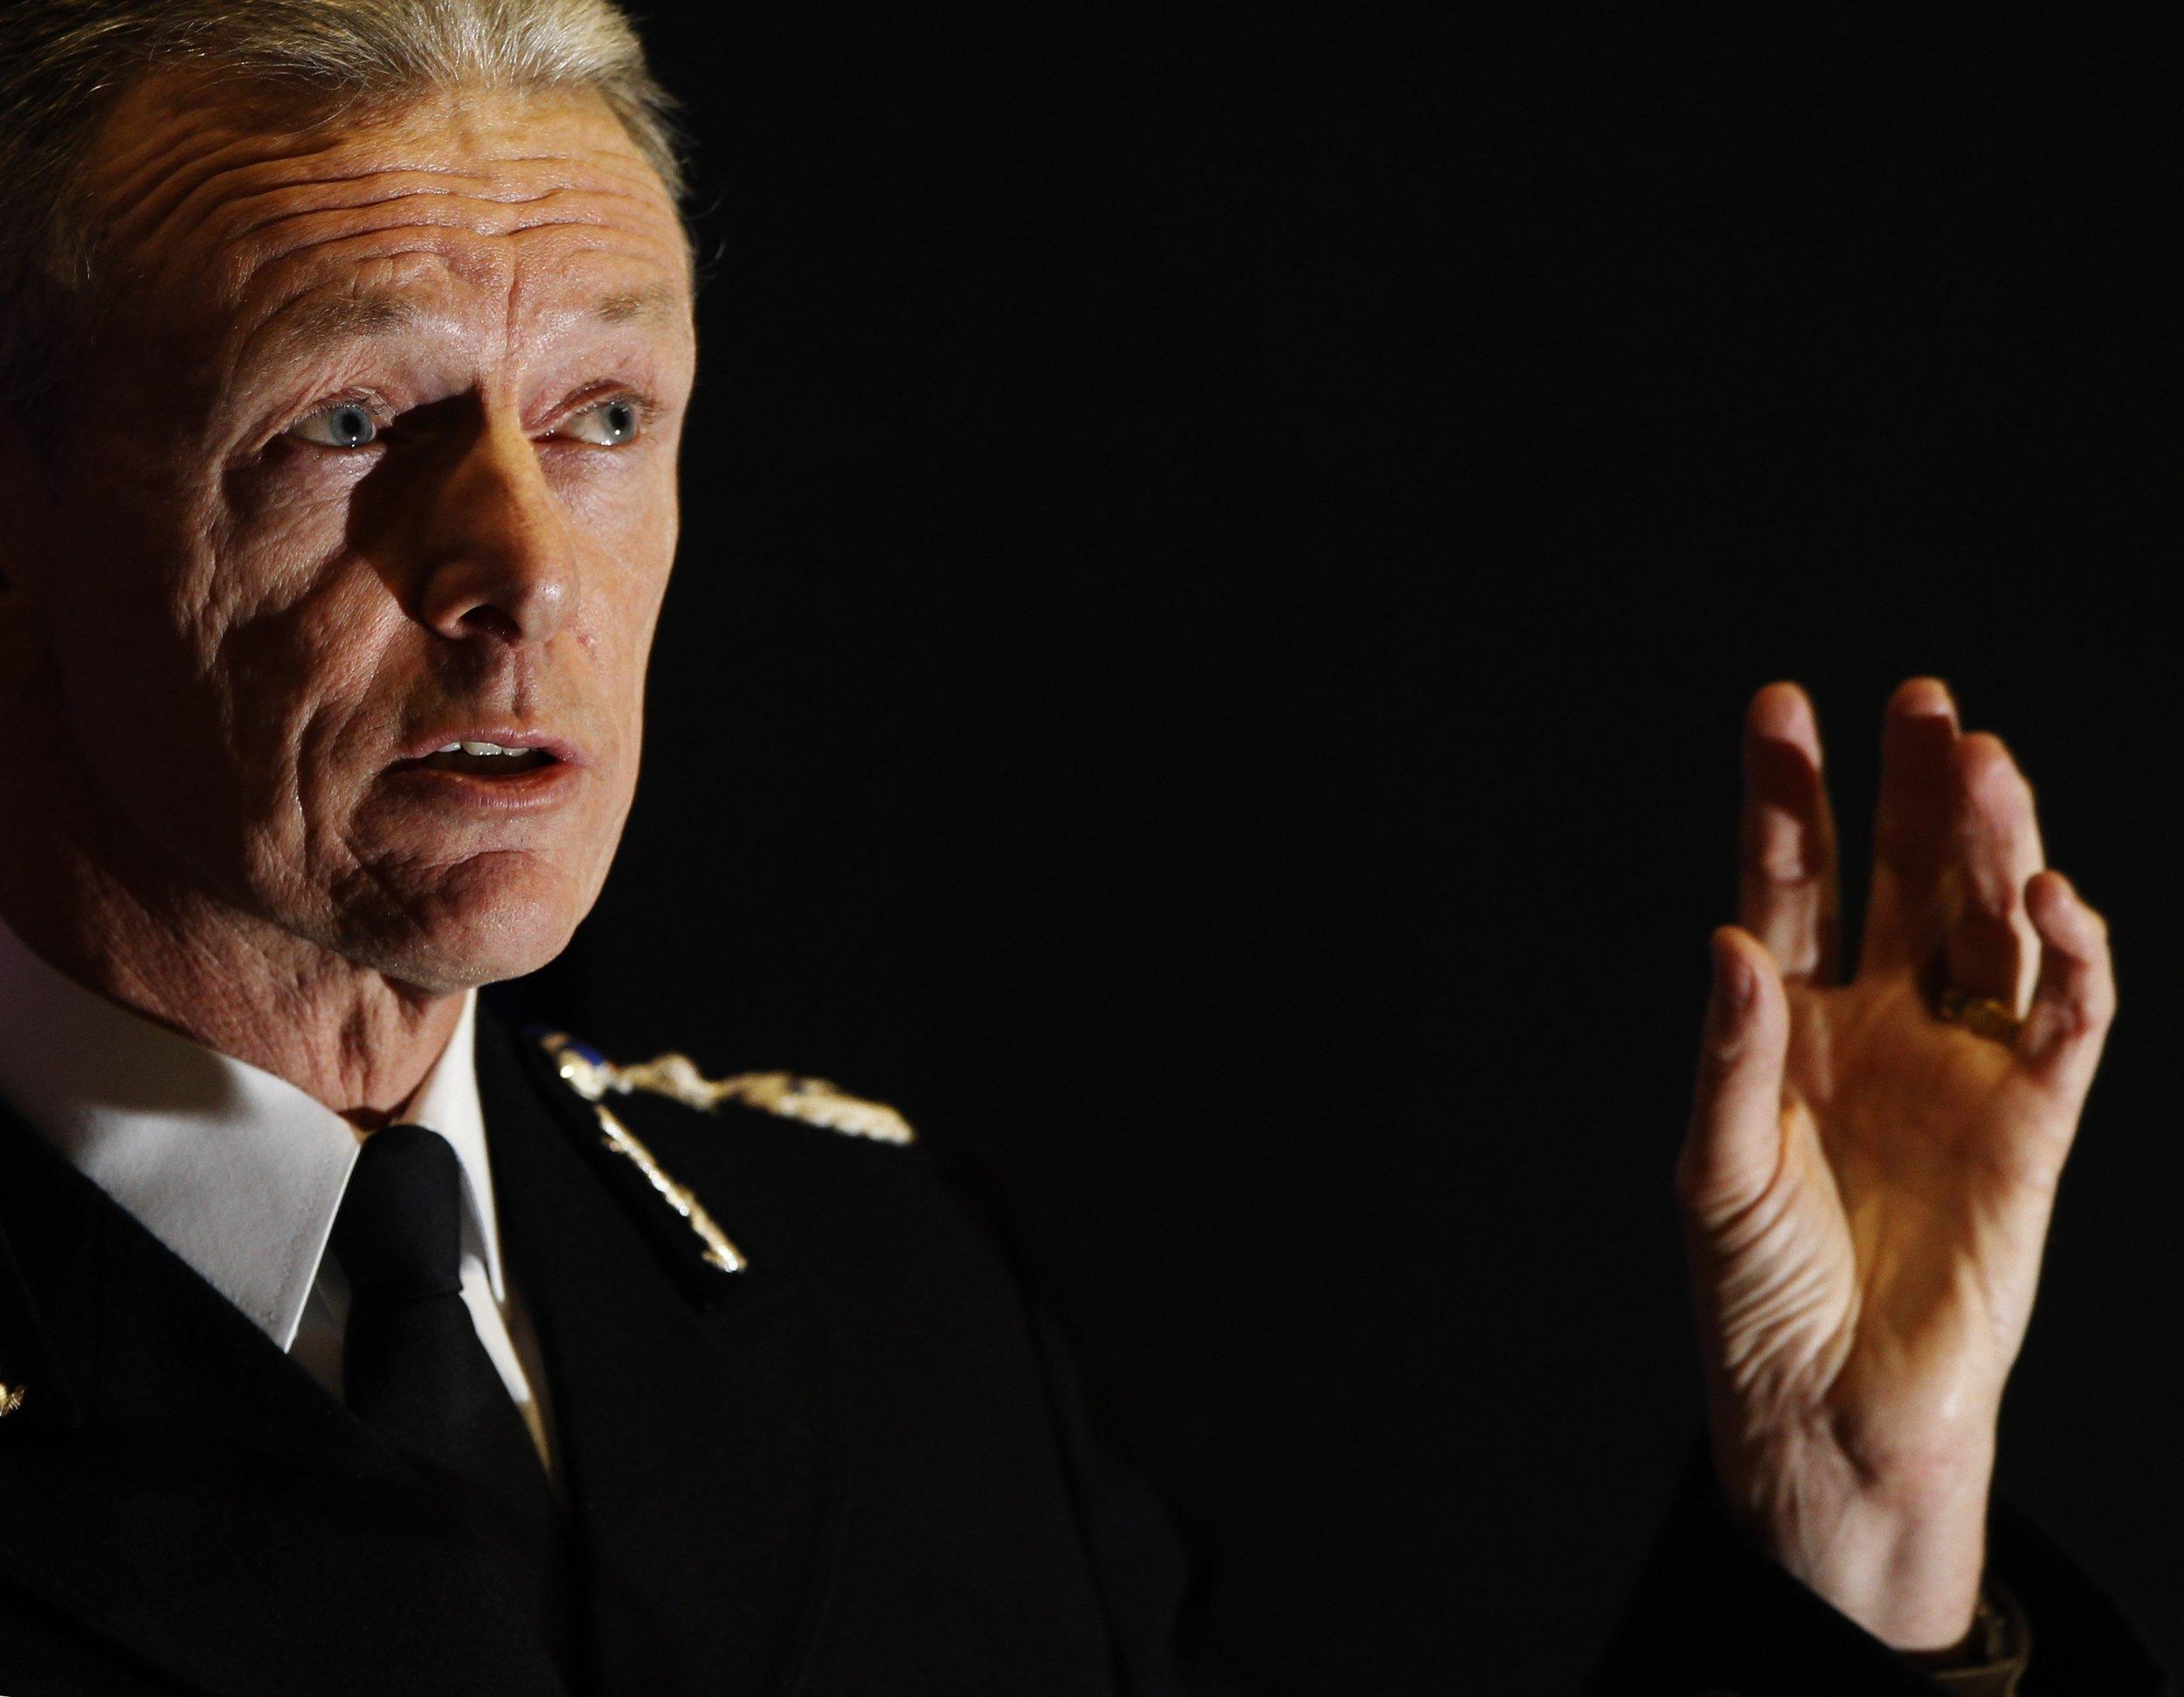 Commissioner of the Metropolitan Police